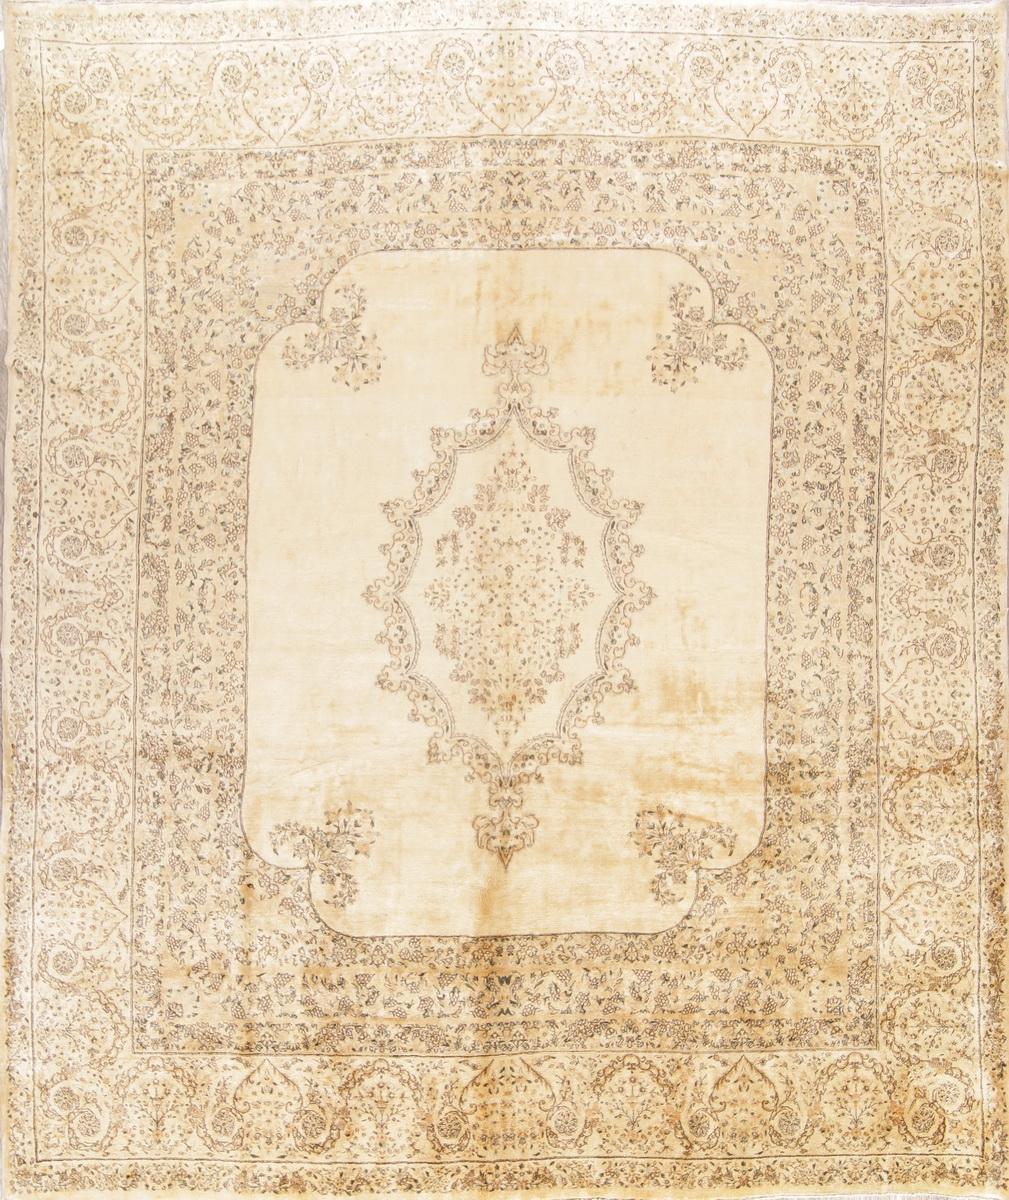 Details About Antique Muted Gold Color Floral 11x13 Ft Kirman Lavar Oriental Area Rug Large